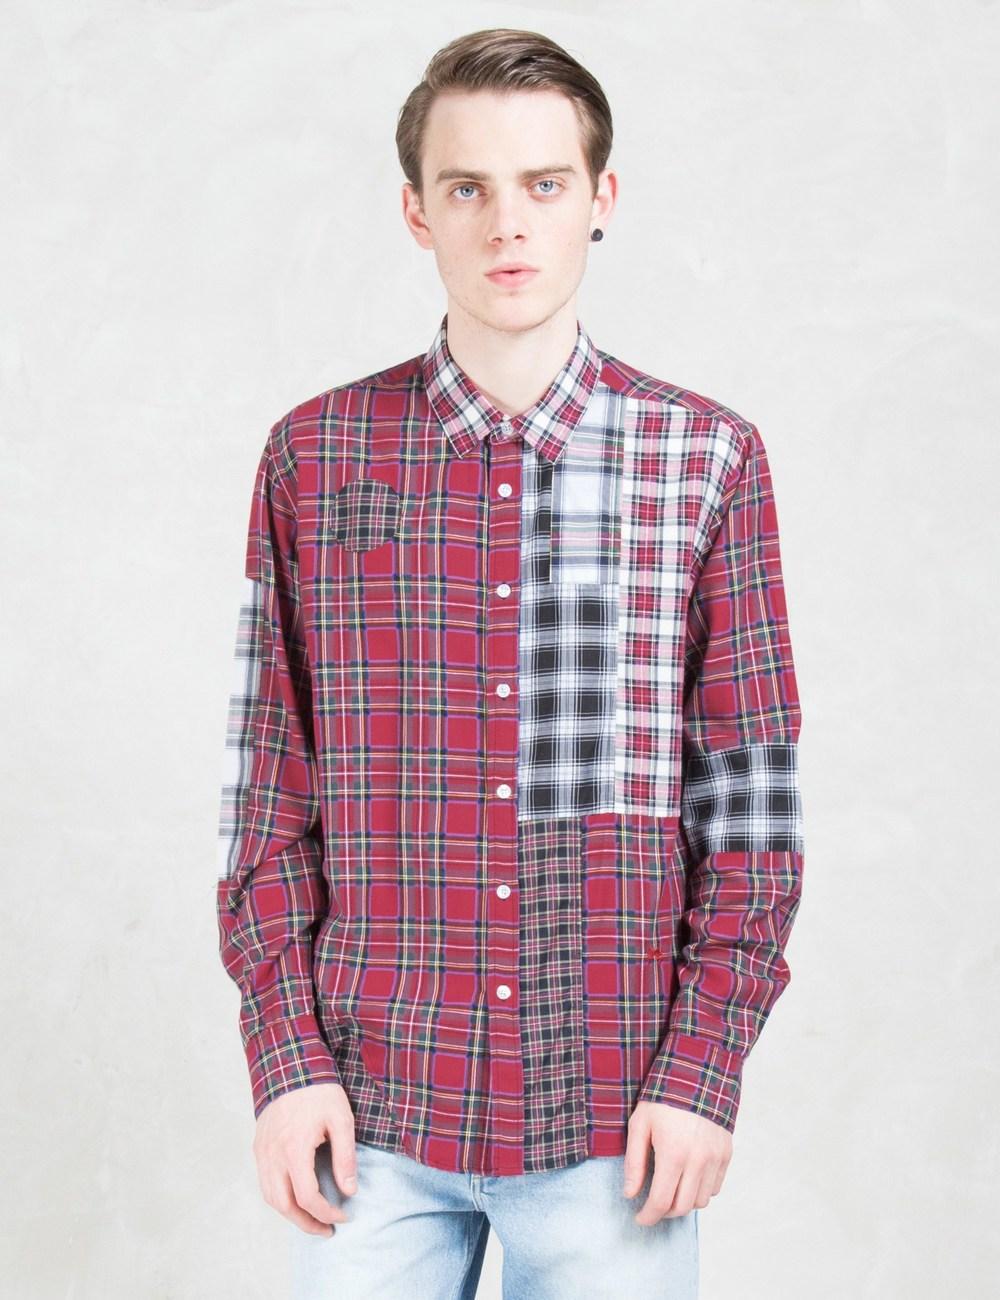 Soulland-SS16-Stitch-shirt-multi-25580-center_large.jpg